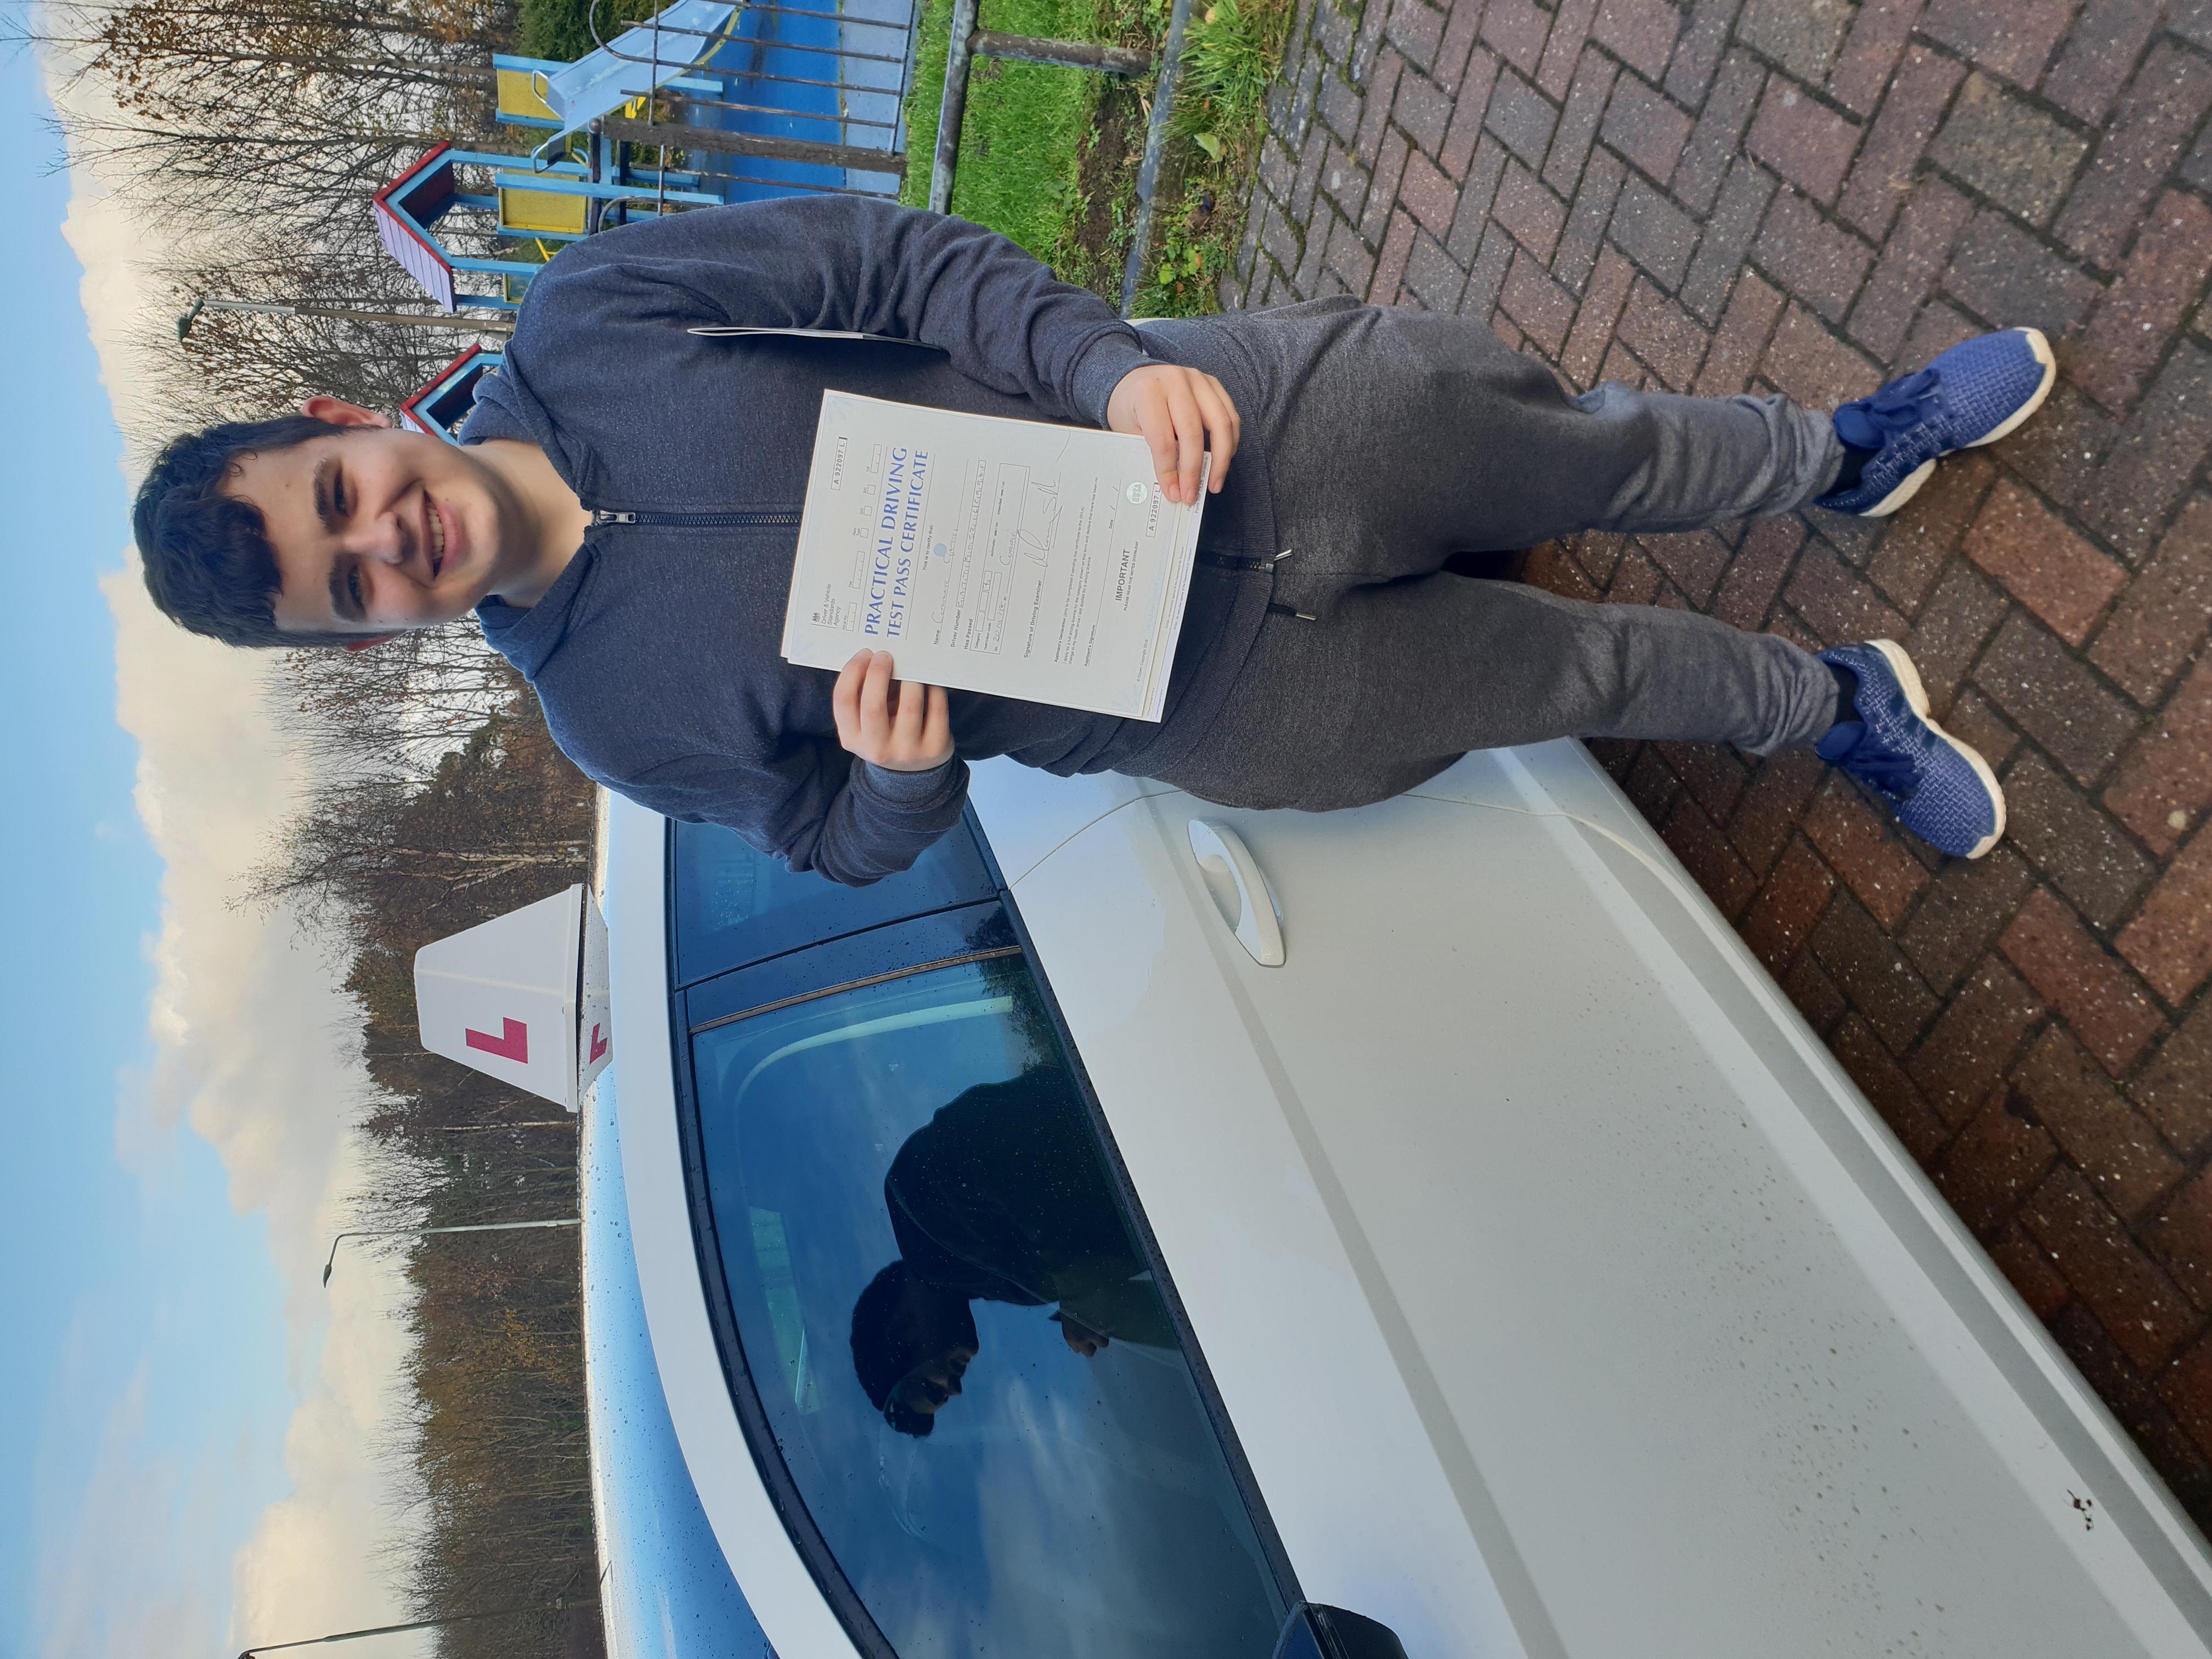 driving Instructor edinburgh